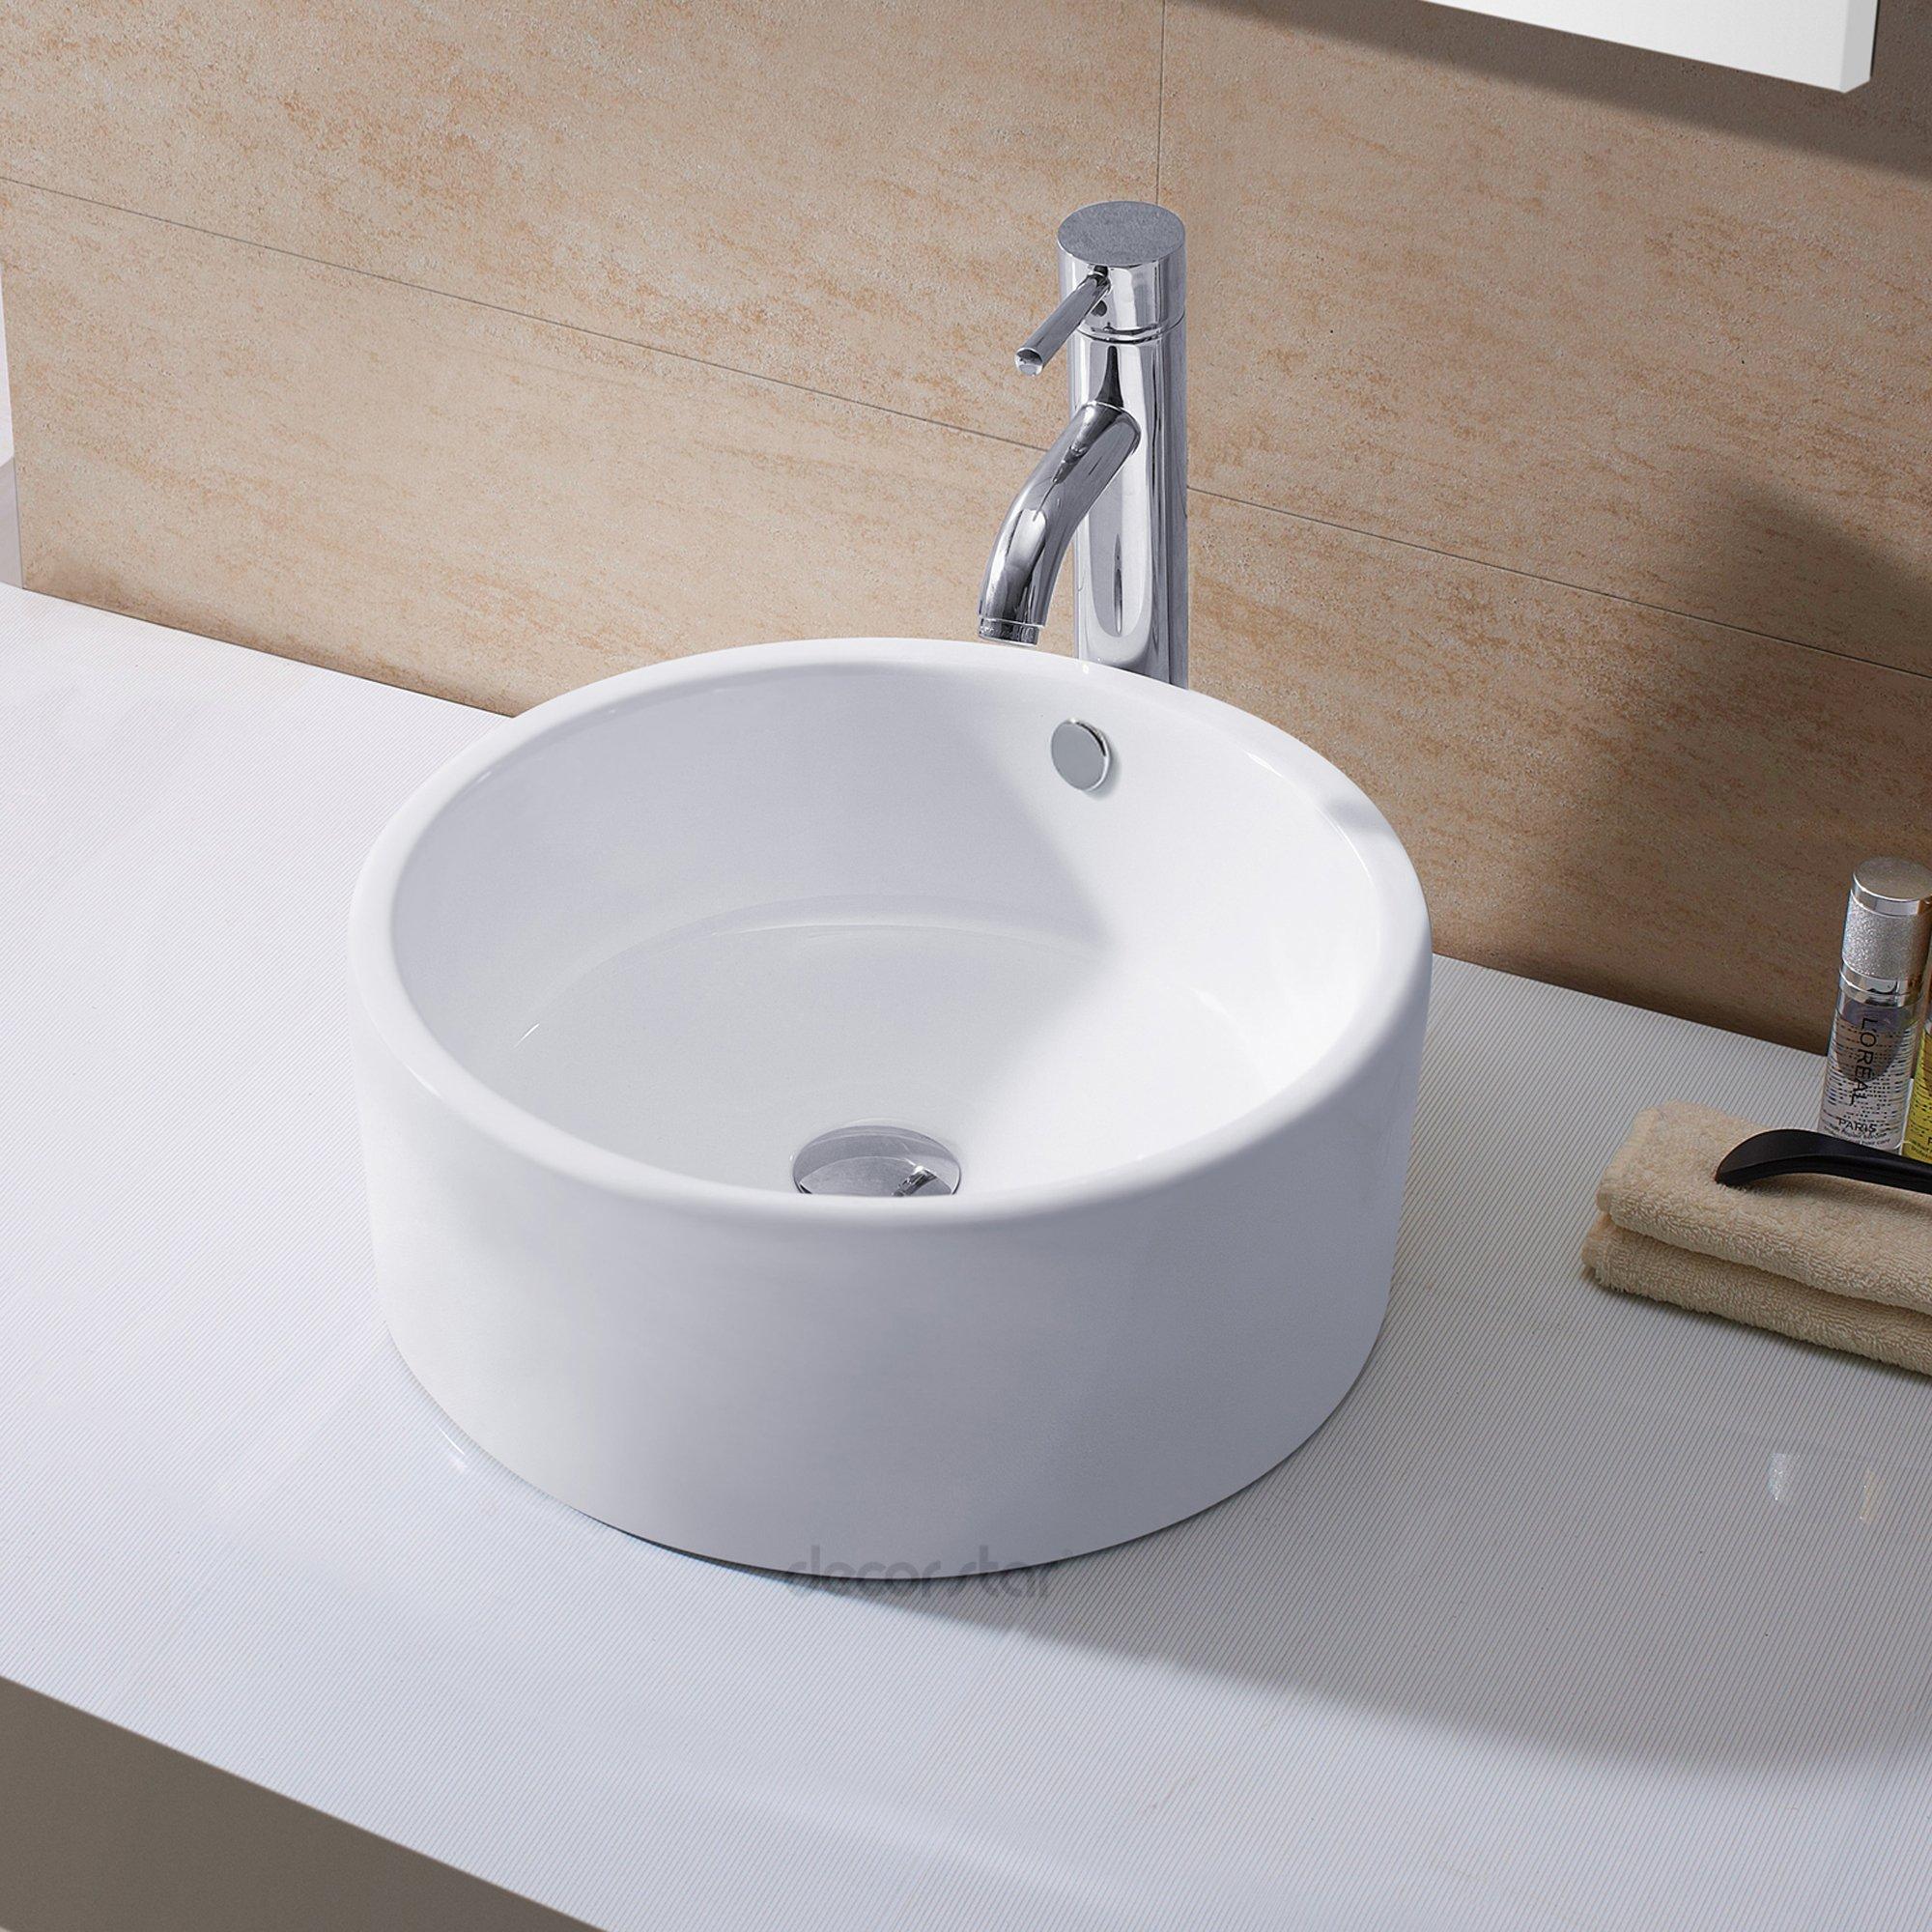 Decor Star CB-008 Bathroom Porcelain Ceramic Vessel Vanity Sink Art Basin